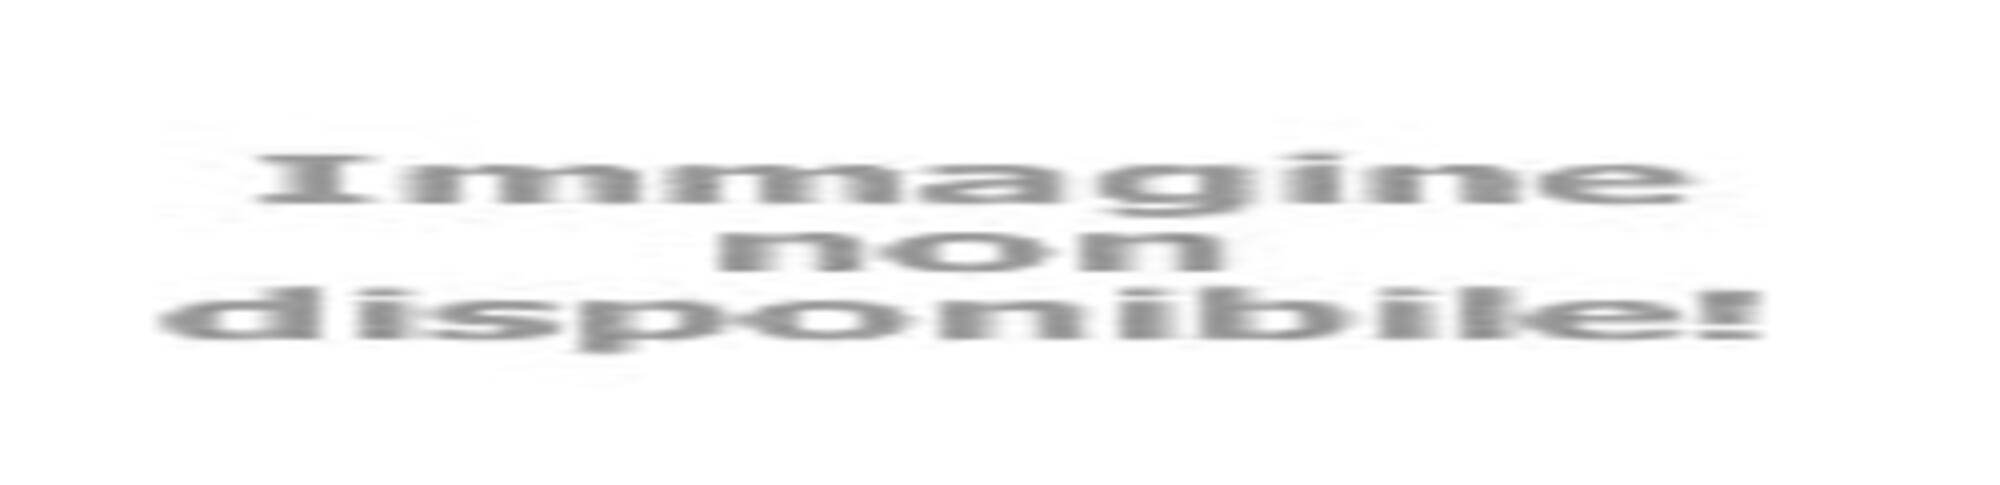 Rimini Volkswagen Classic 2017